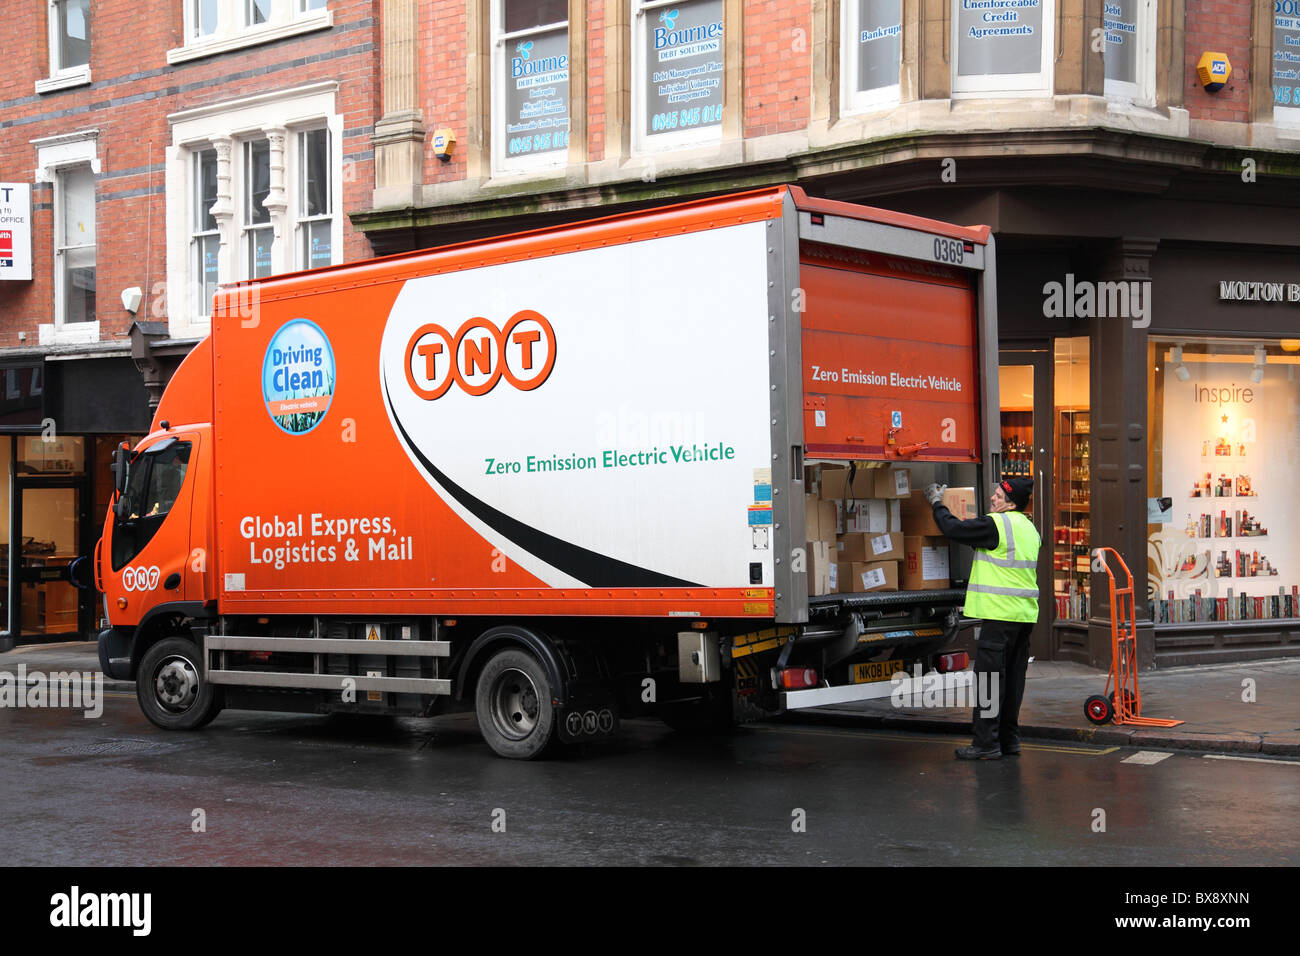 A TNT zero emission electric vehicle on a U.K. street. - Stock Image